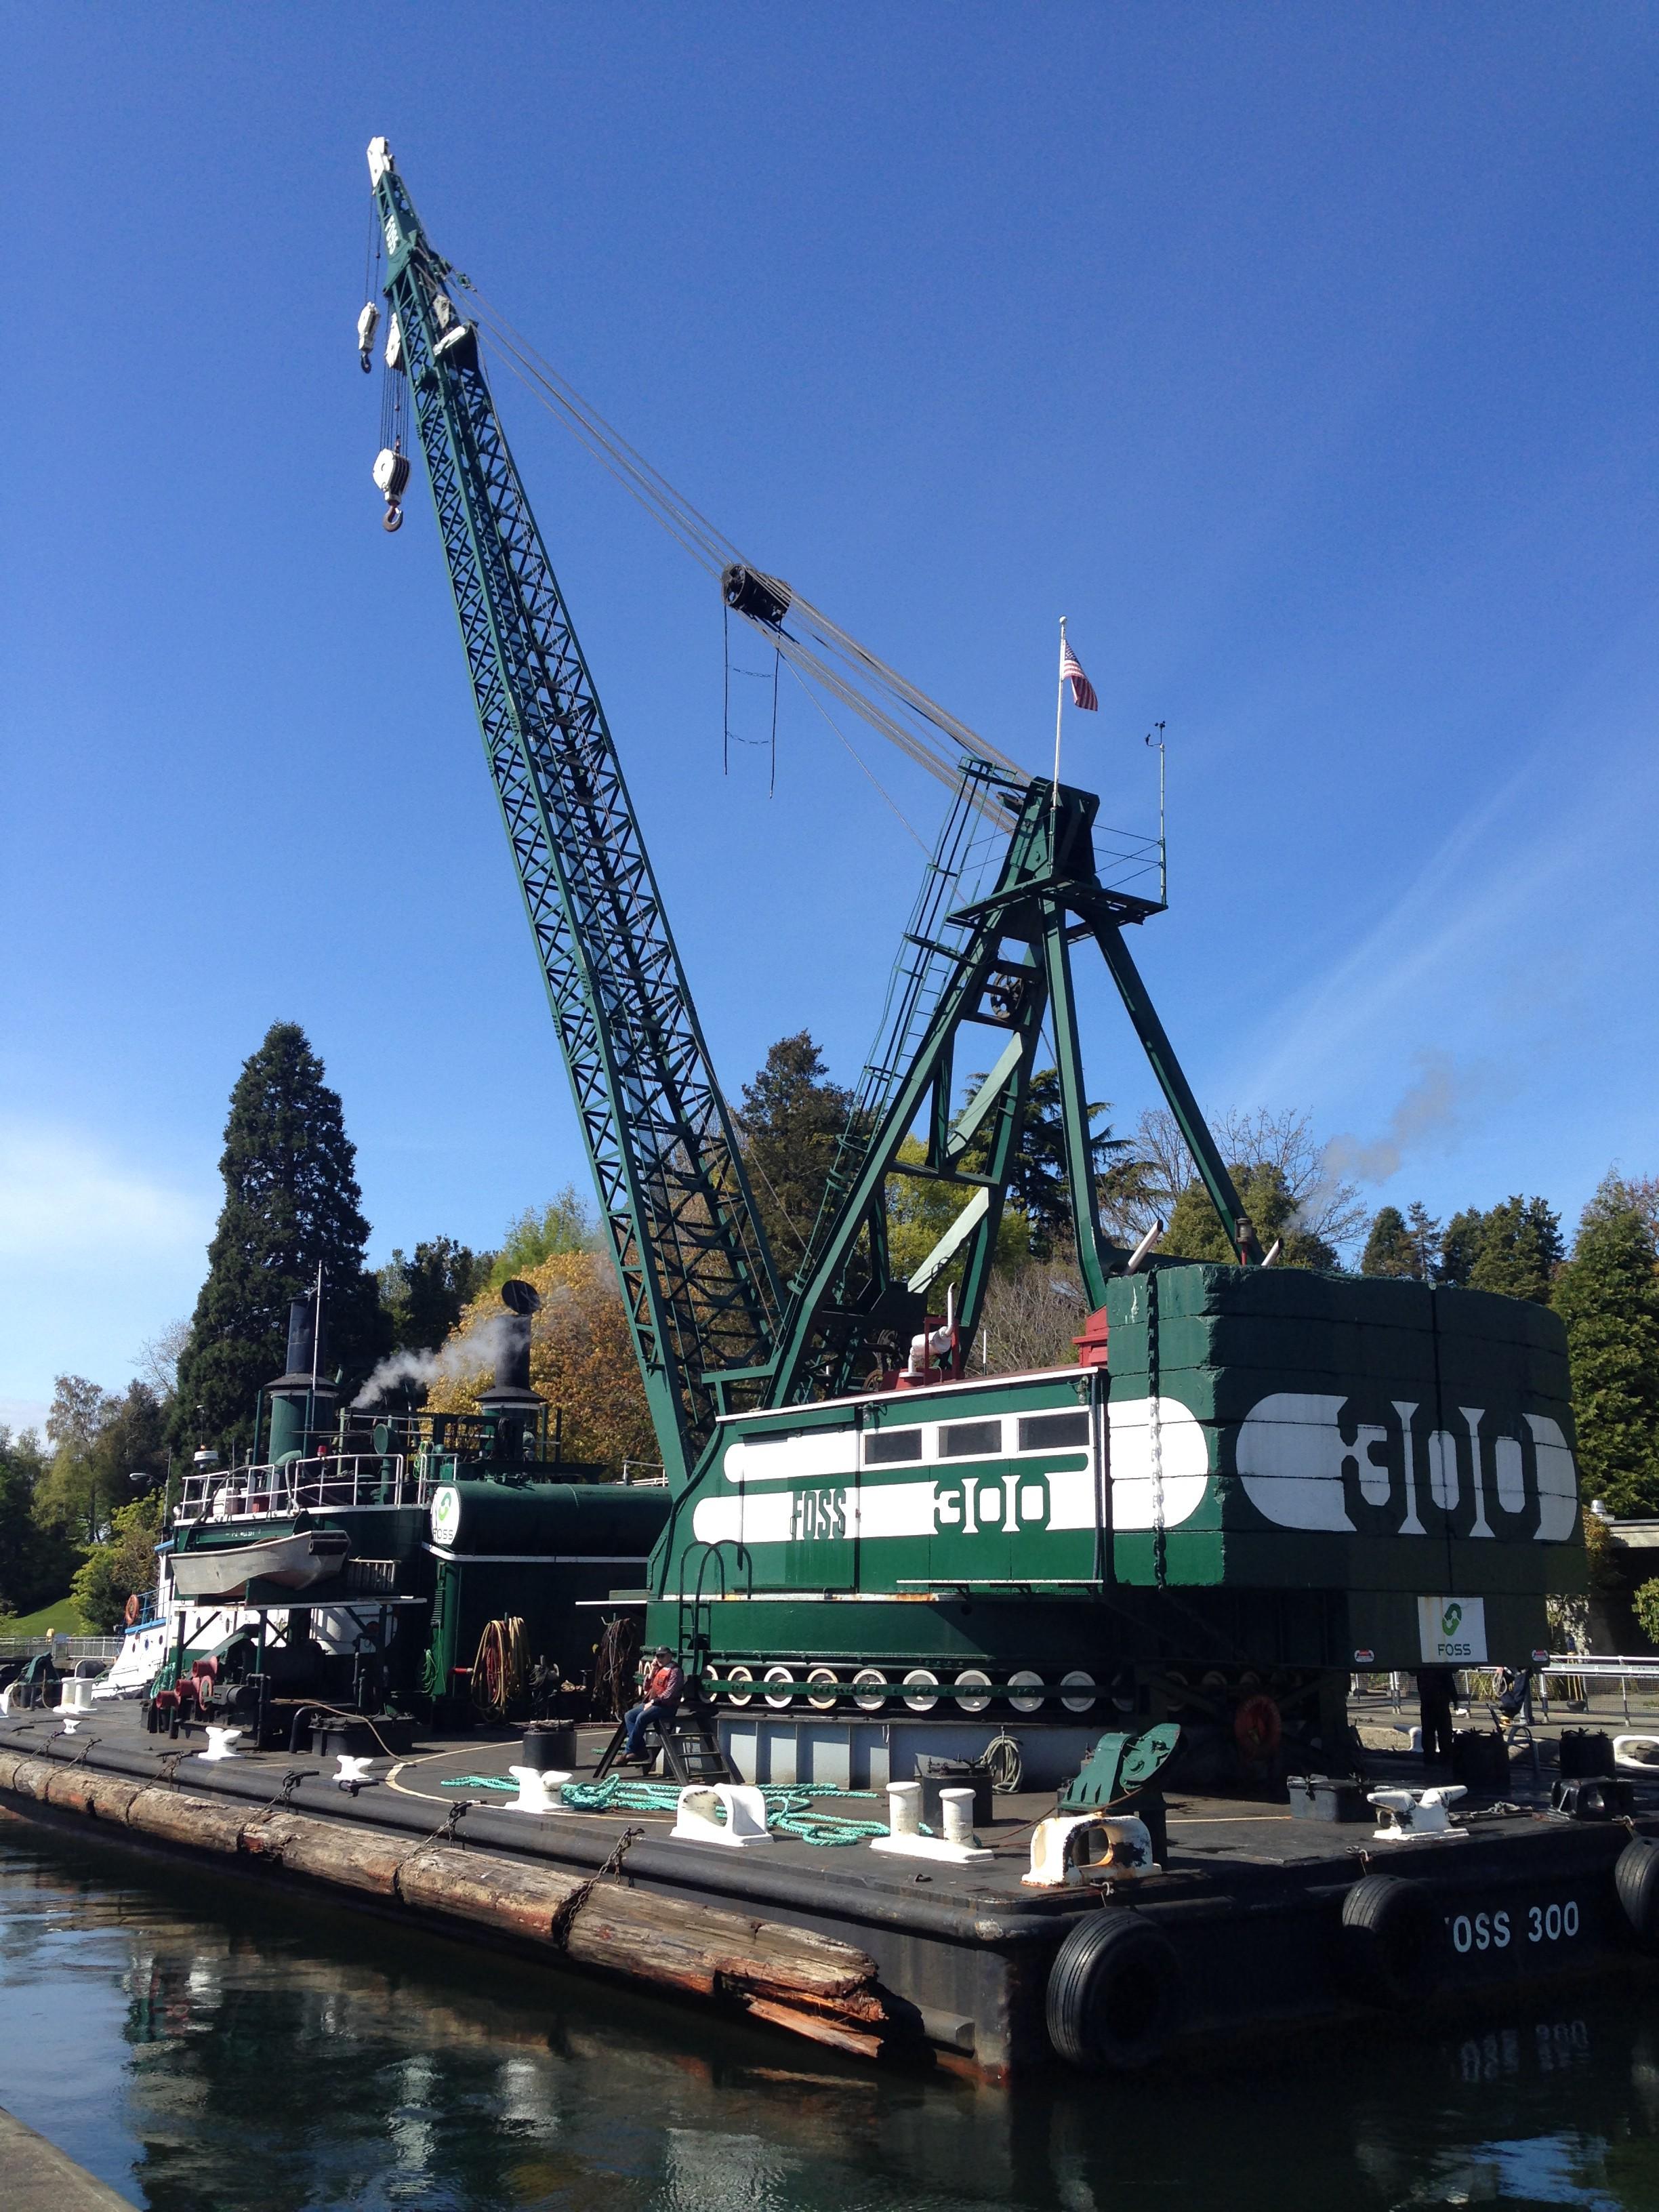 Foss 300 derrick, The last steam crane still operating on the West Coast of North America. Leaves the Ballard Locks